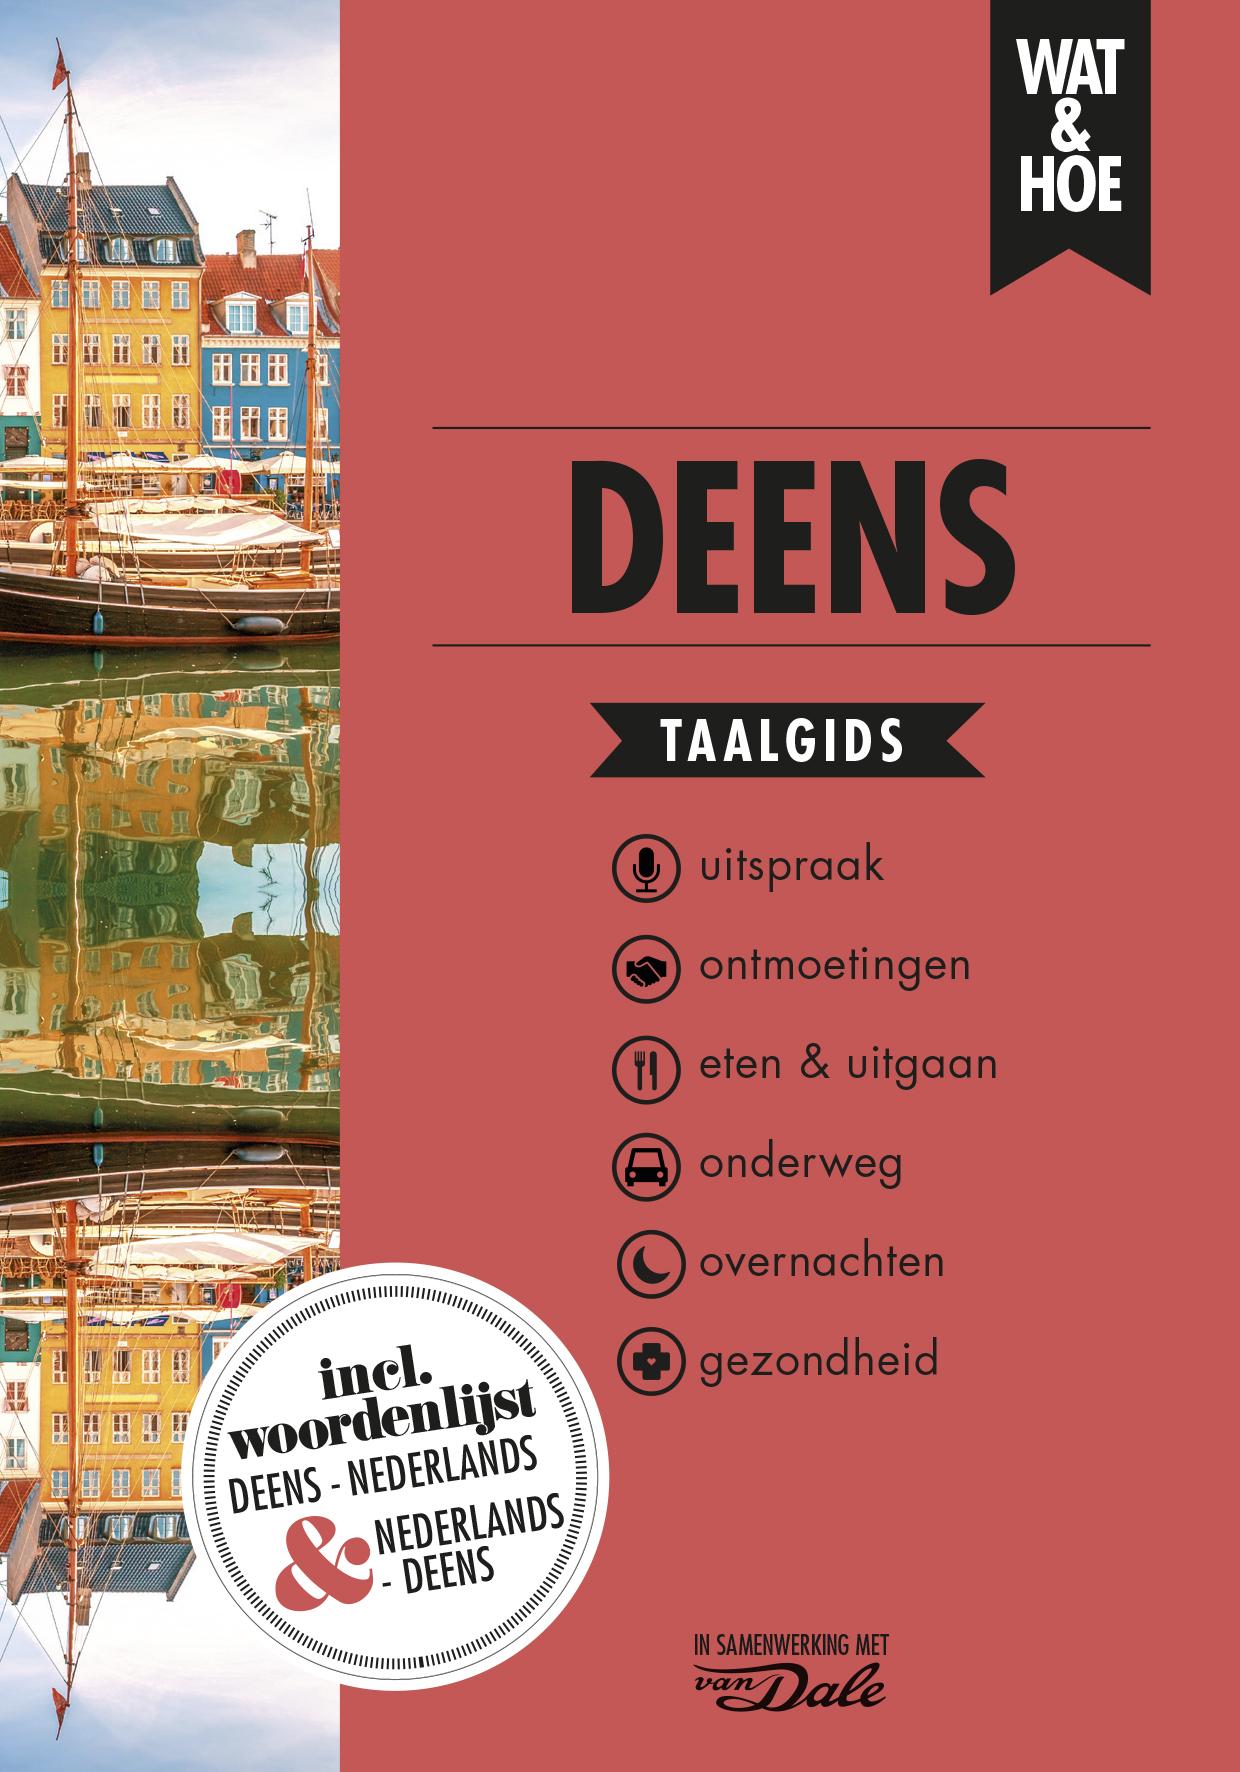 Deens